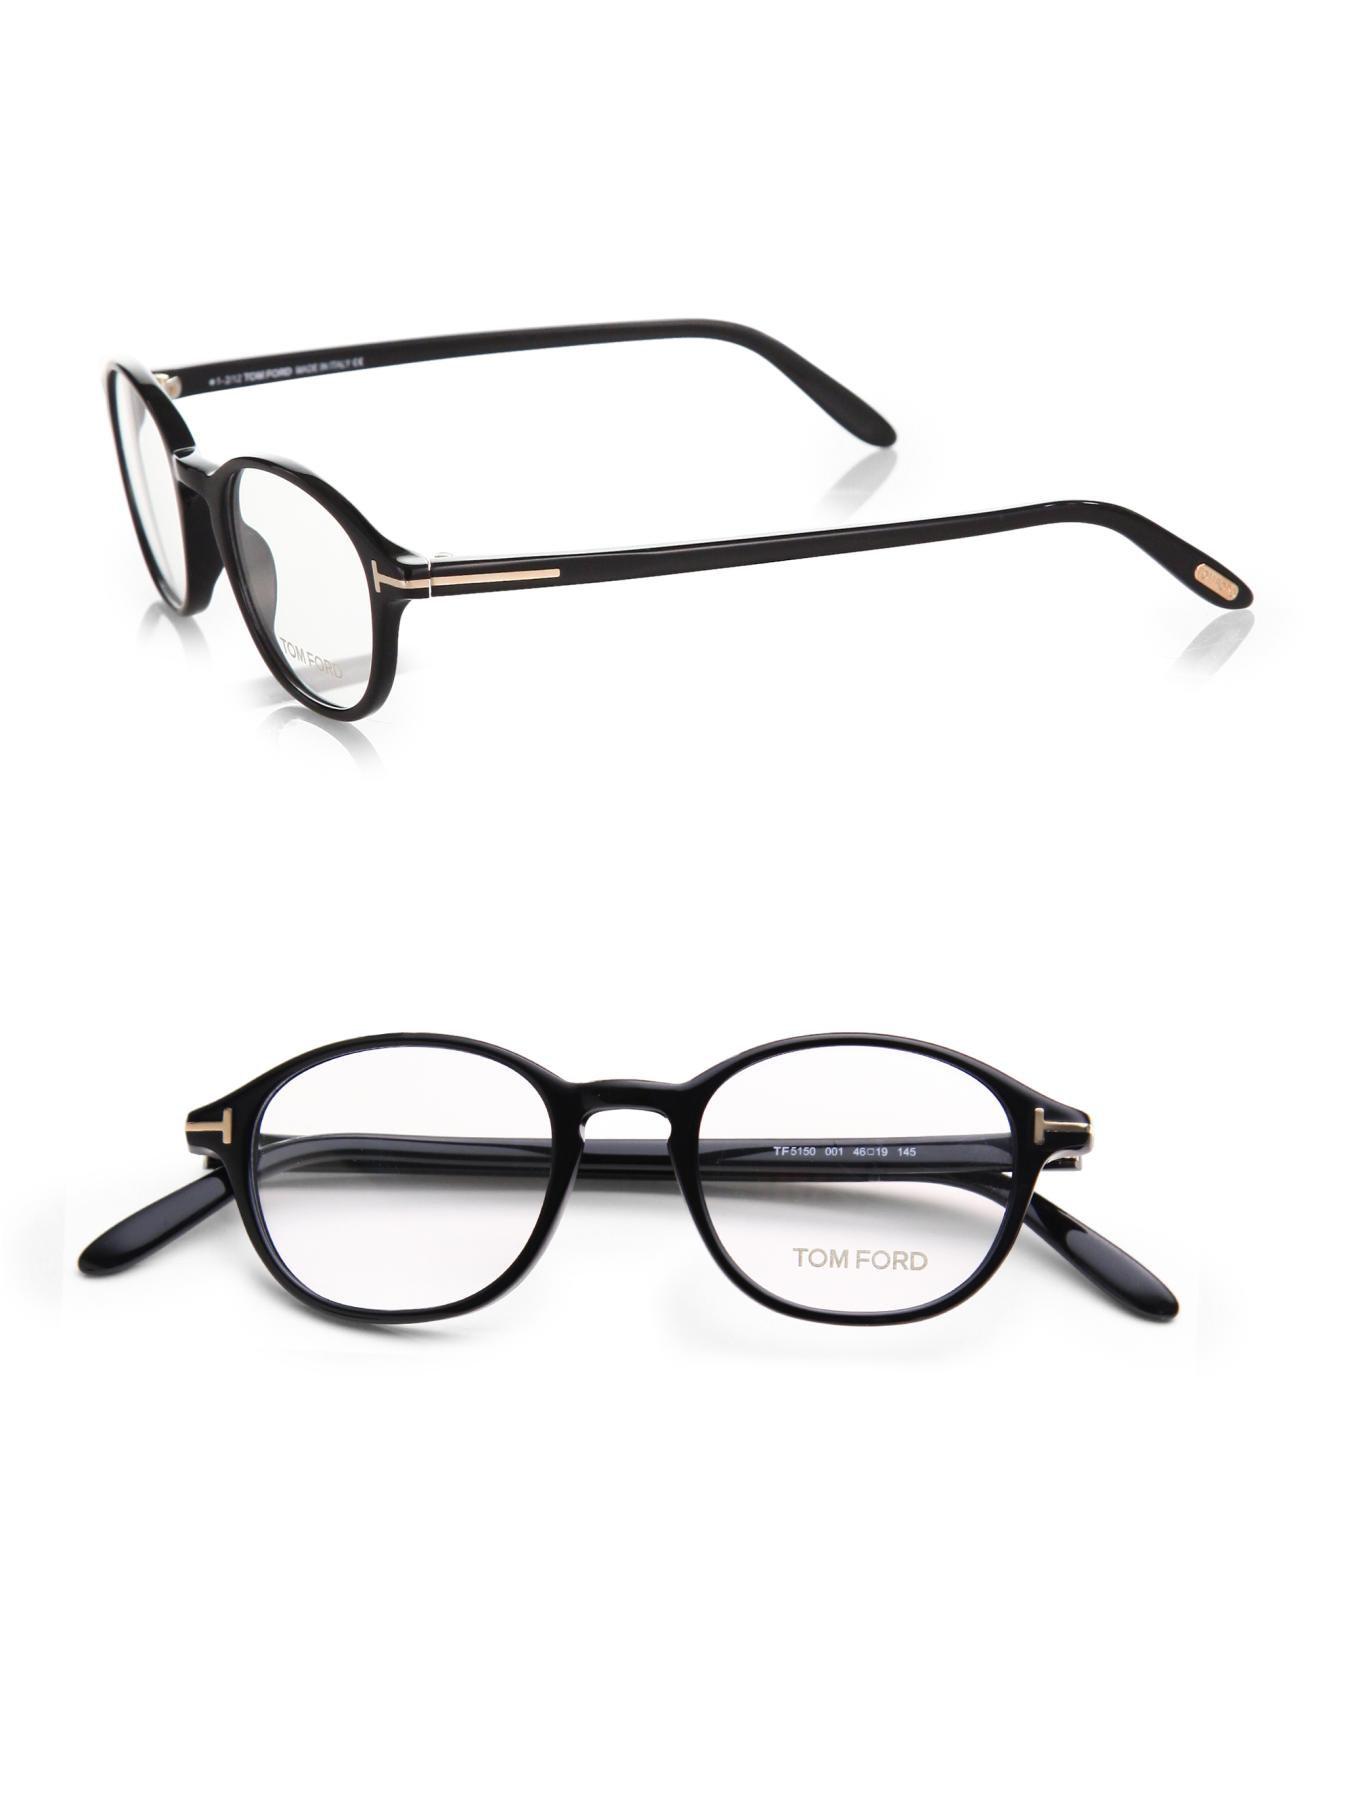 52298f0782 Tom Ford 5150 Optical Round Frames in Black for Men - Lyst